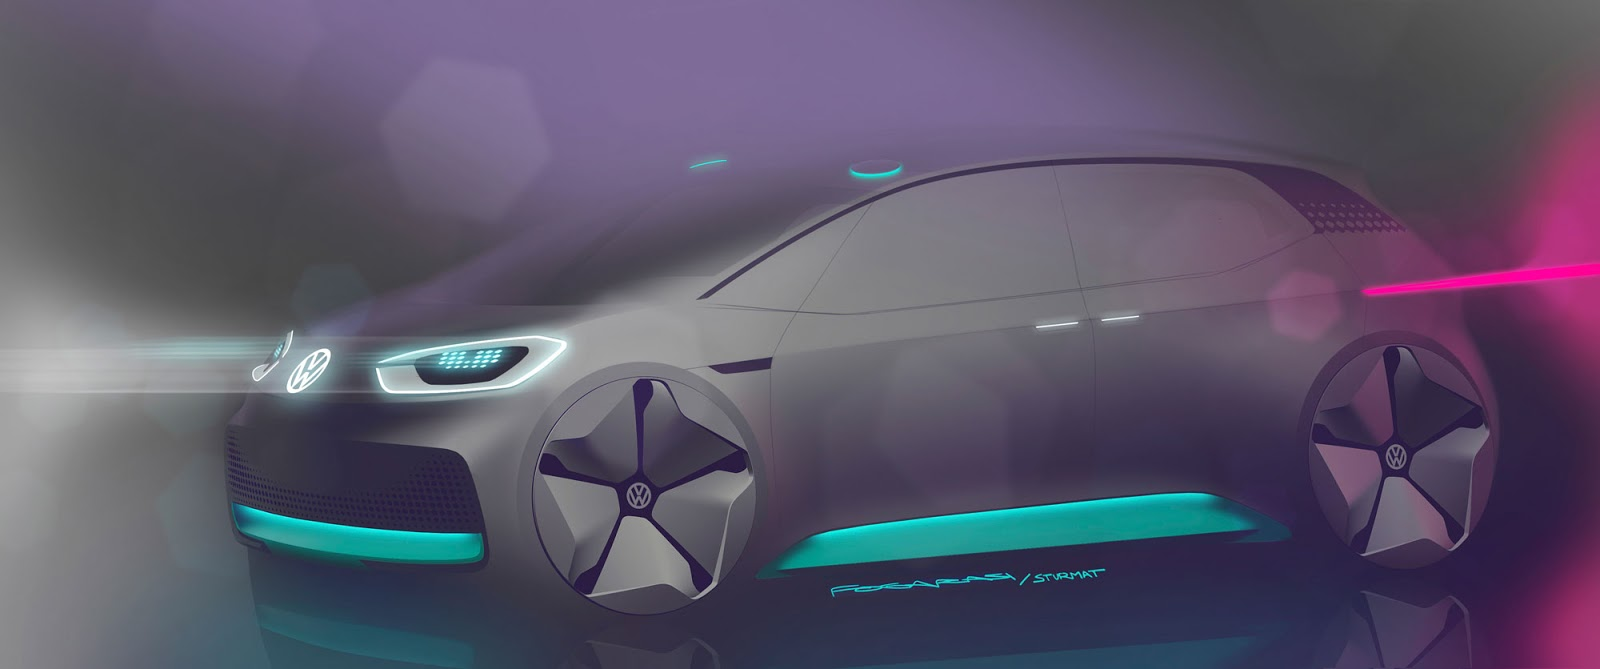 Volkswagen ID sketch by Laszlo Fogarasi-Benko and Sandra Sturmat